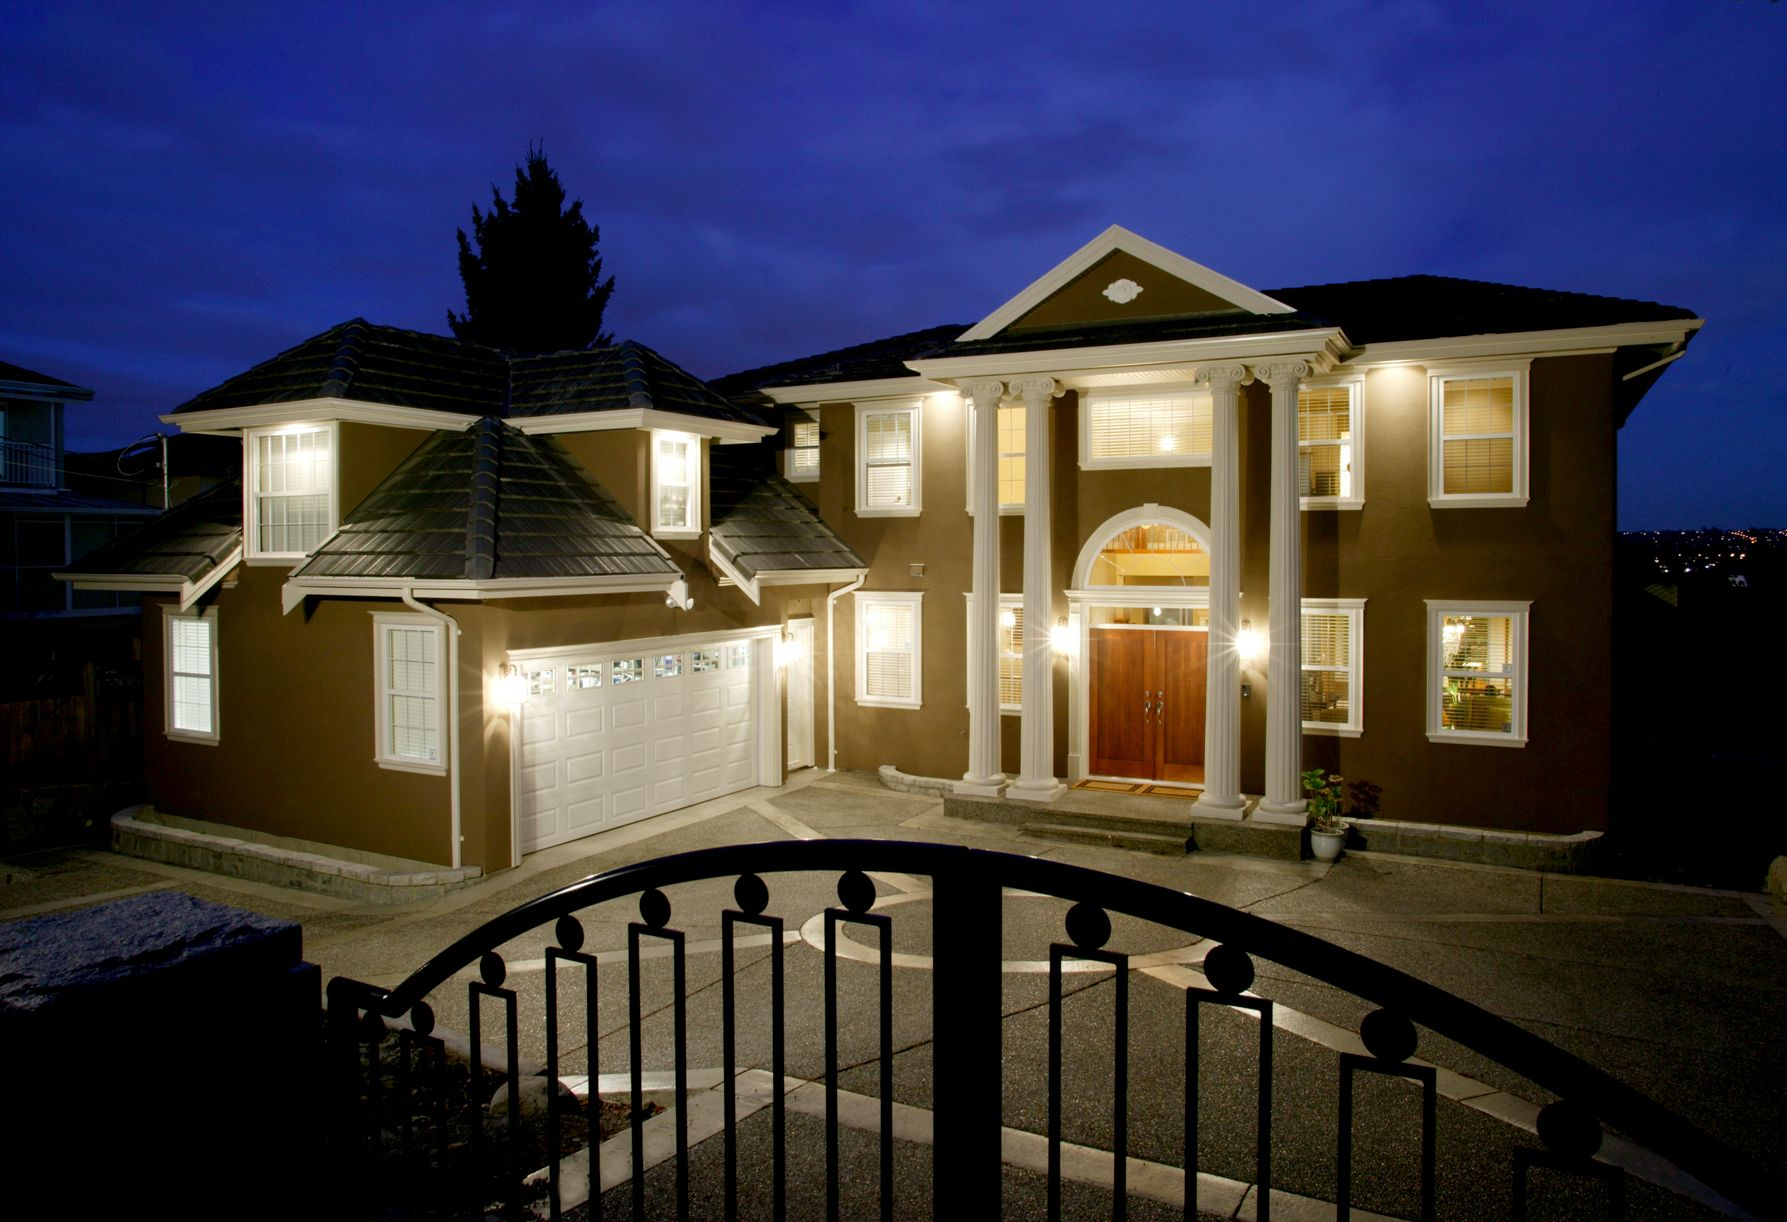 Aluminum Vinyl Or Natural Siding Pros And Cons Traditional Home Exteriors Exterior Lighting Design Modern Exterior Lighting